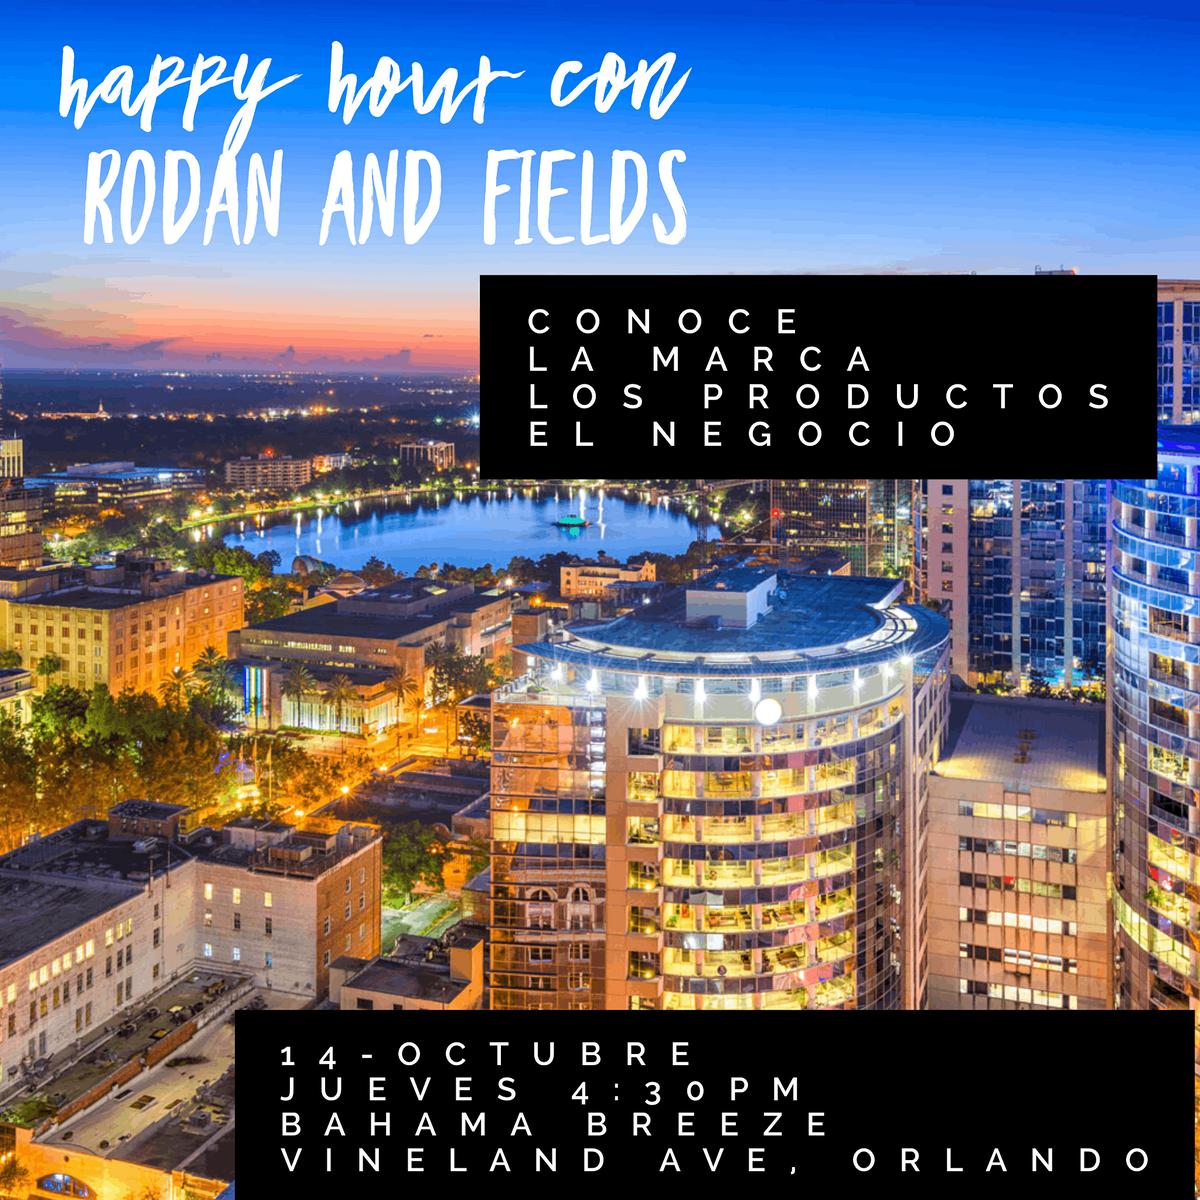 Happy Hour con Rodan and Fields